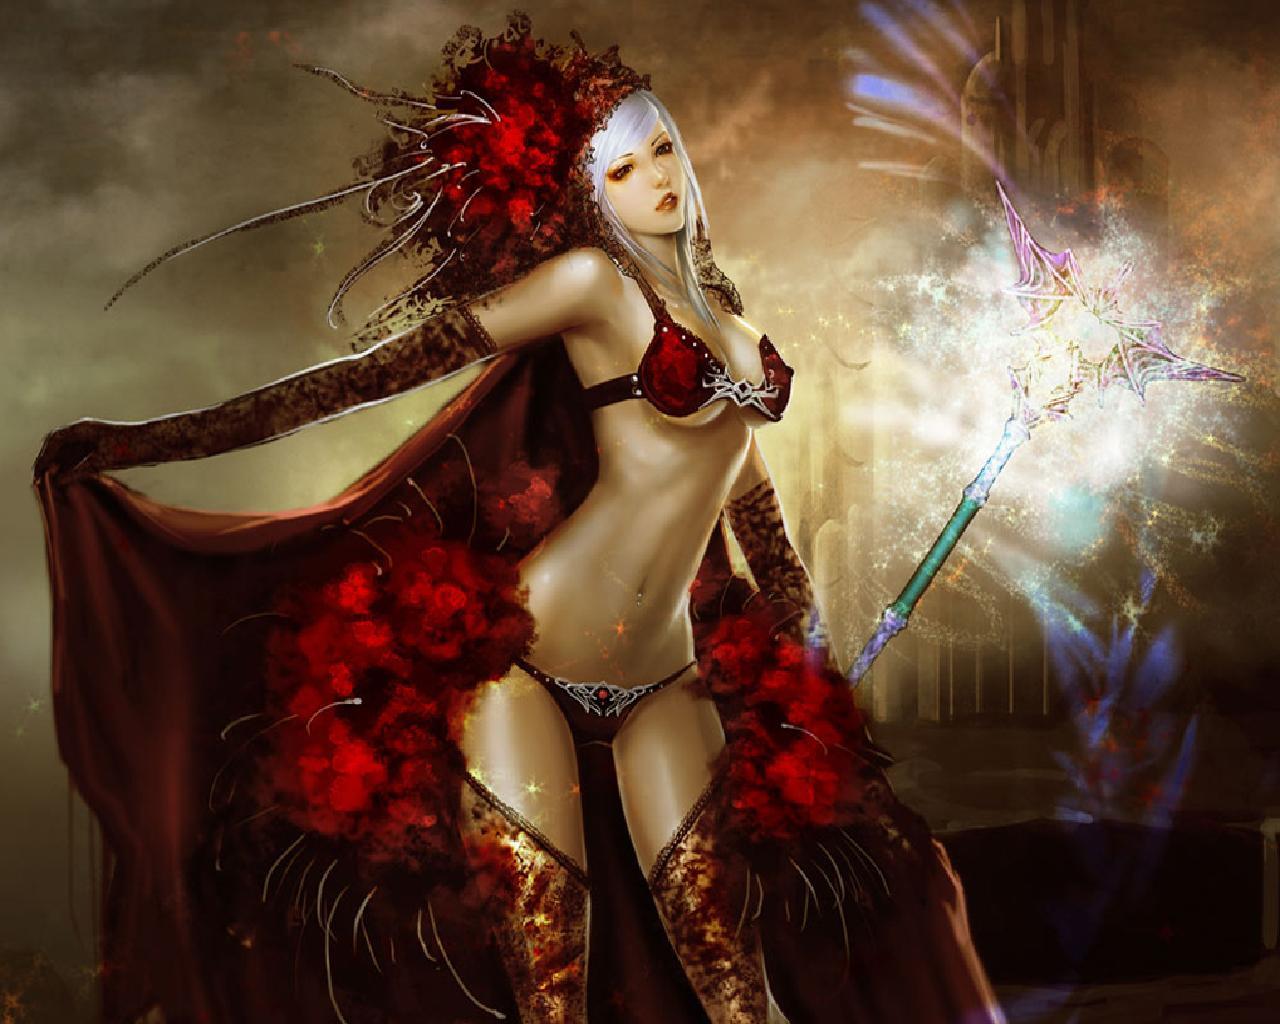 The Red Sorceress Wallpaper__yvt2.jpg